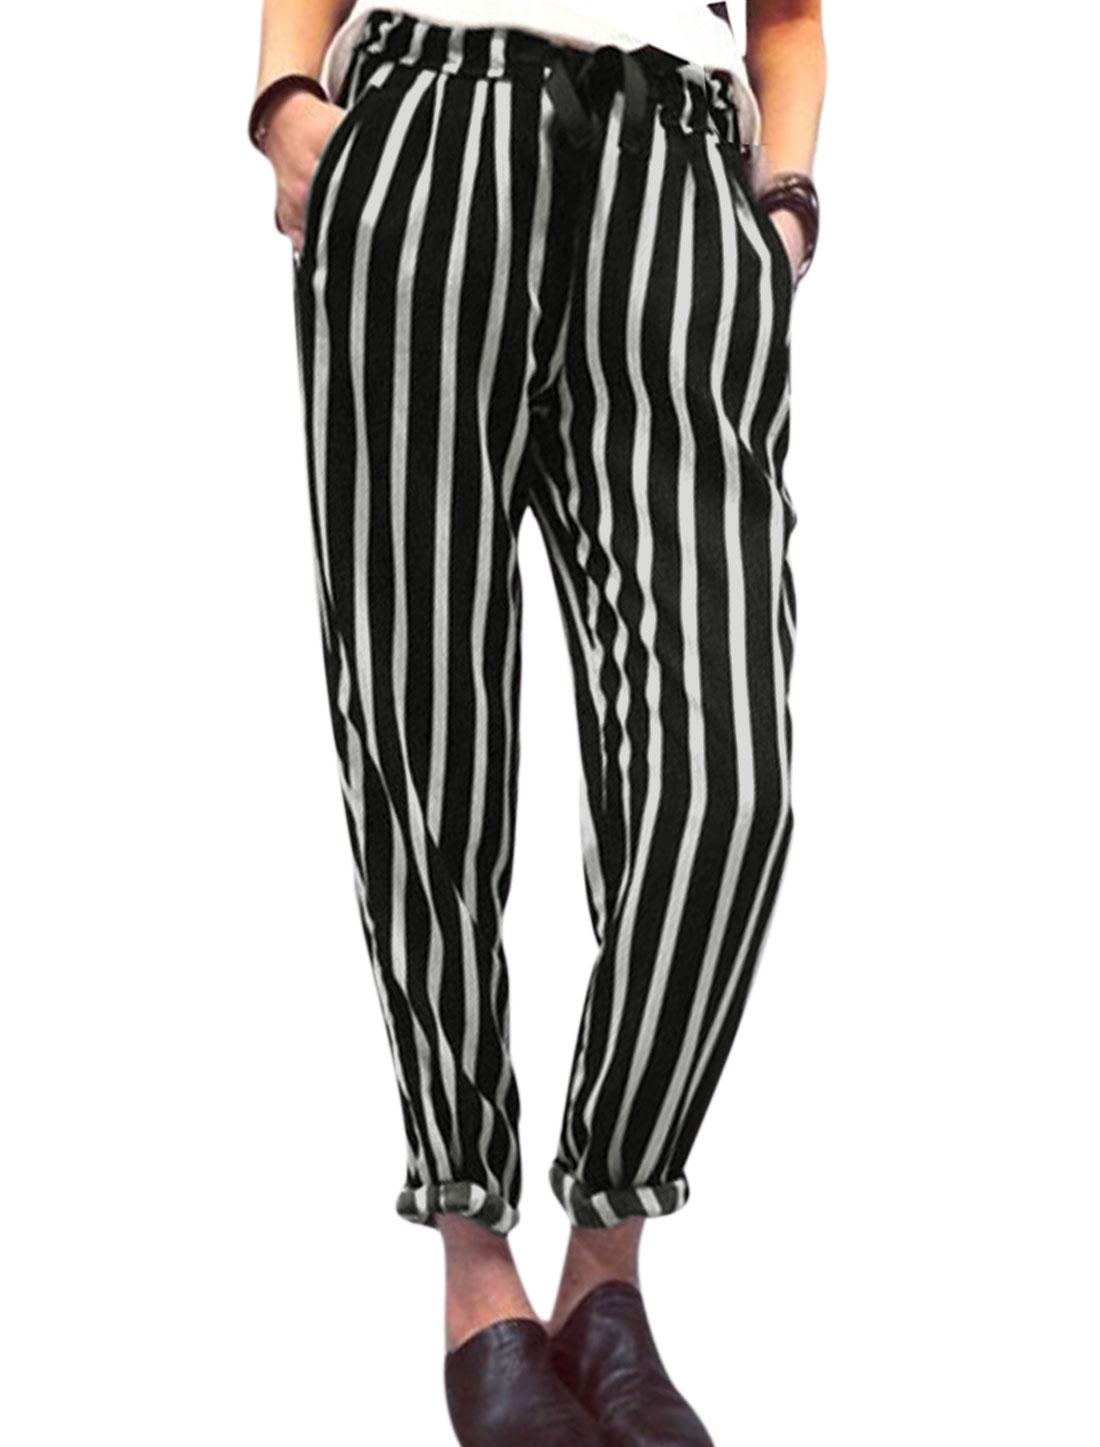 Women Drawstring Waist Vertical Stripes Semi Sheer Chiffon Harem Pants Black S